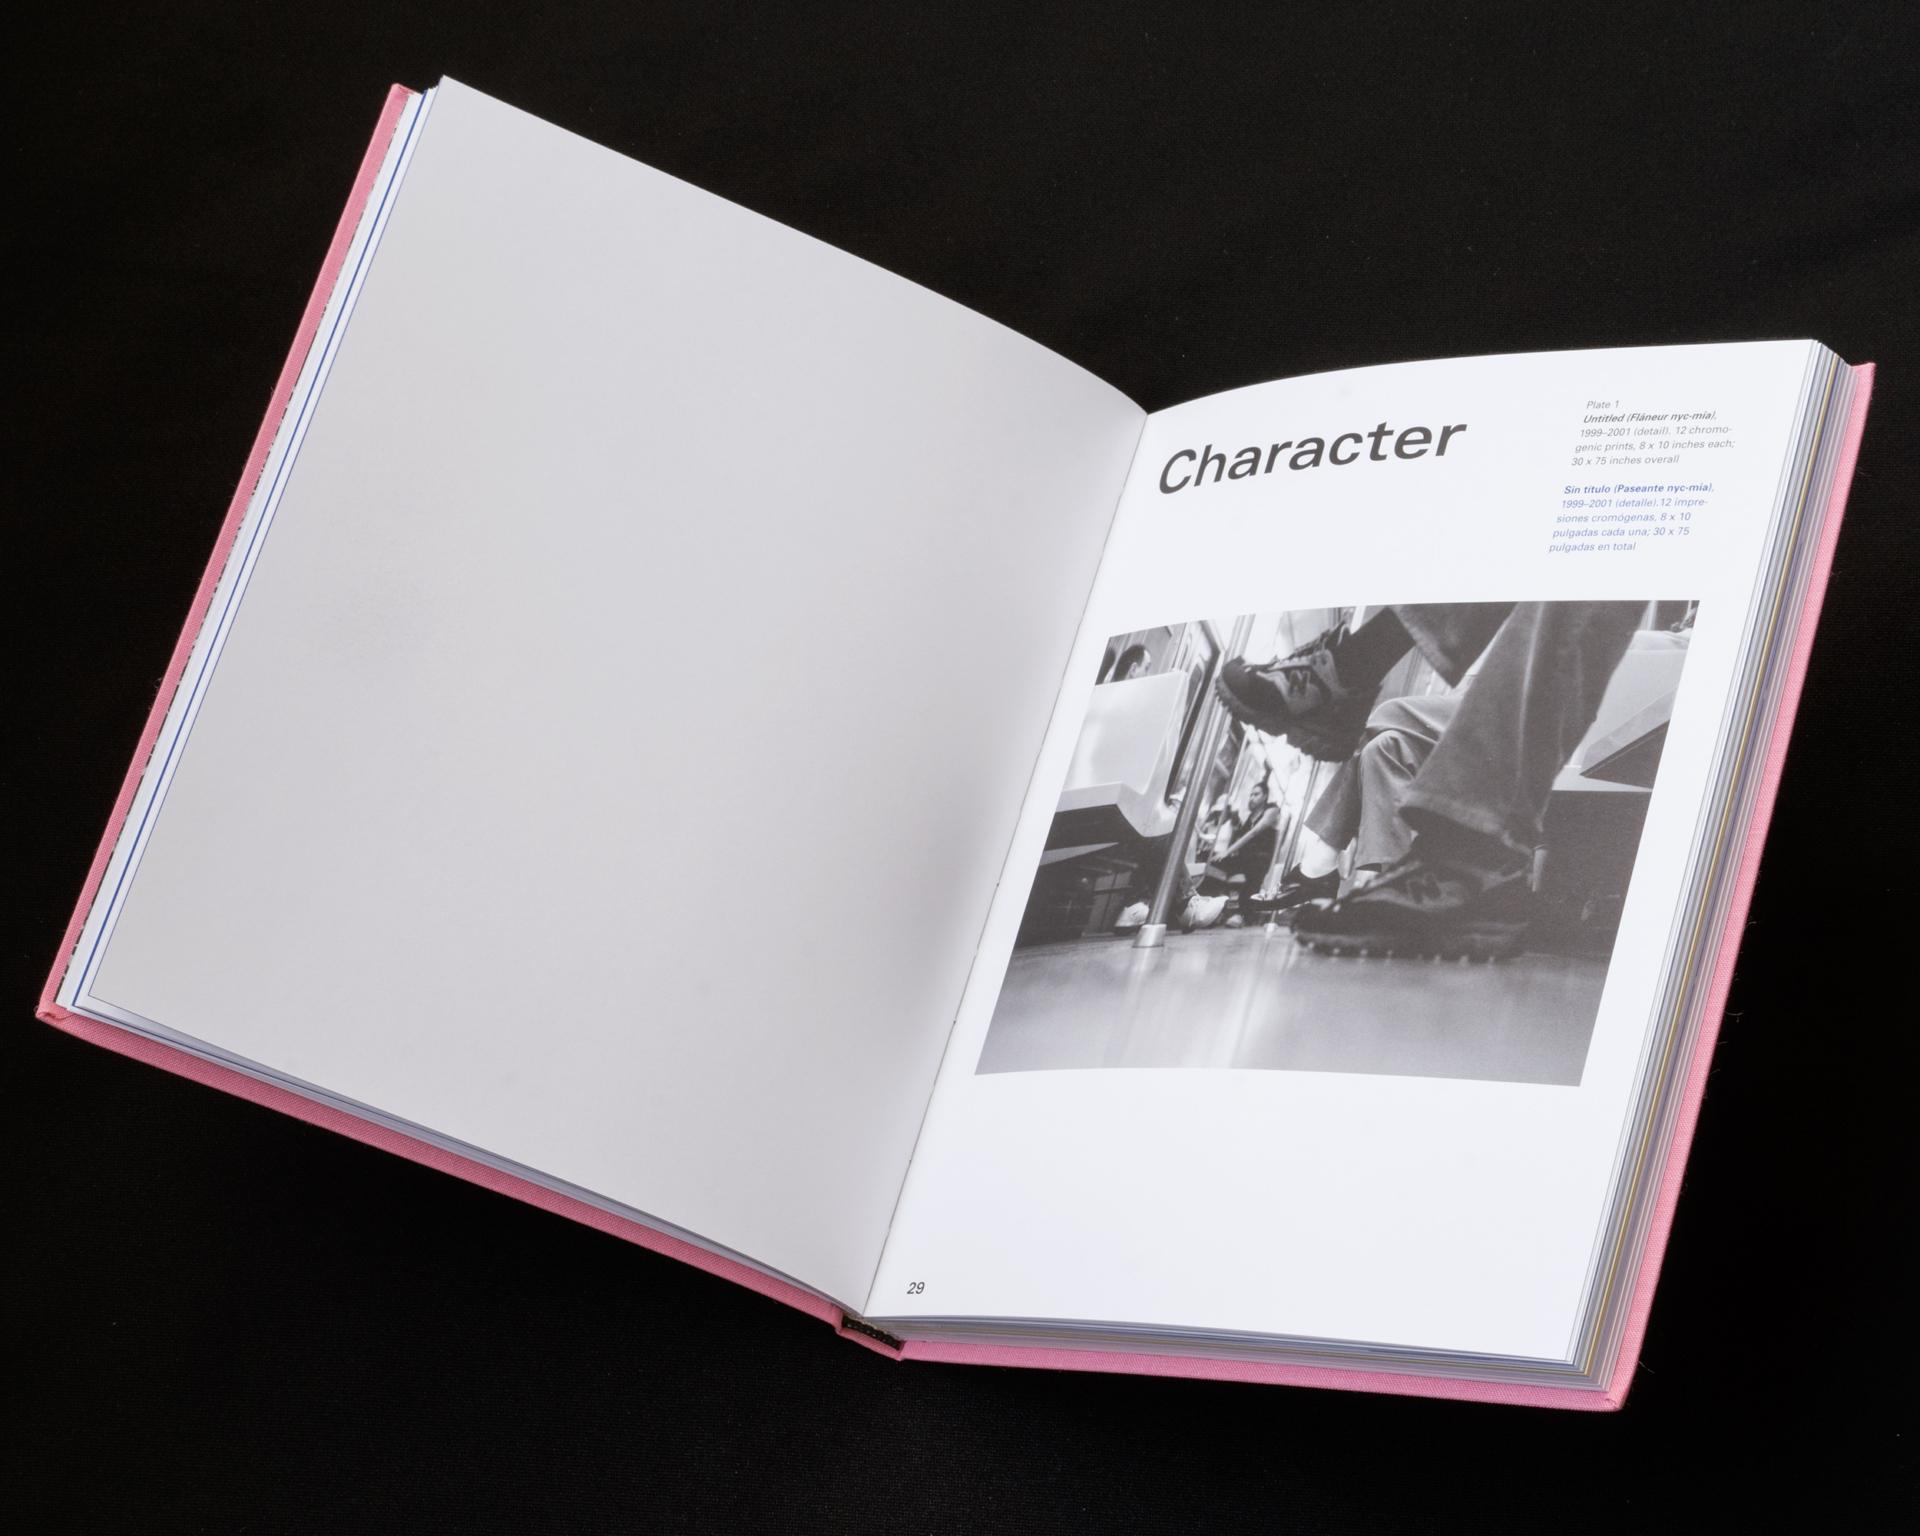 STUDIO  LHOOQ Adler Guerrier: Formulating a Plot